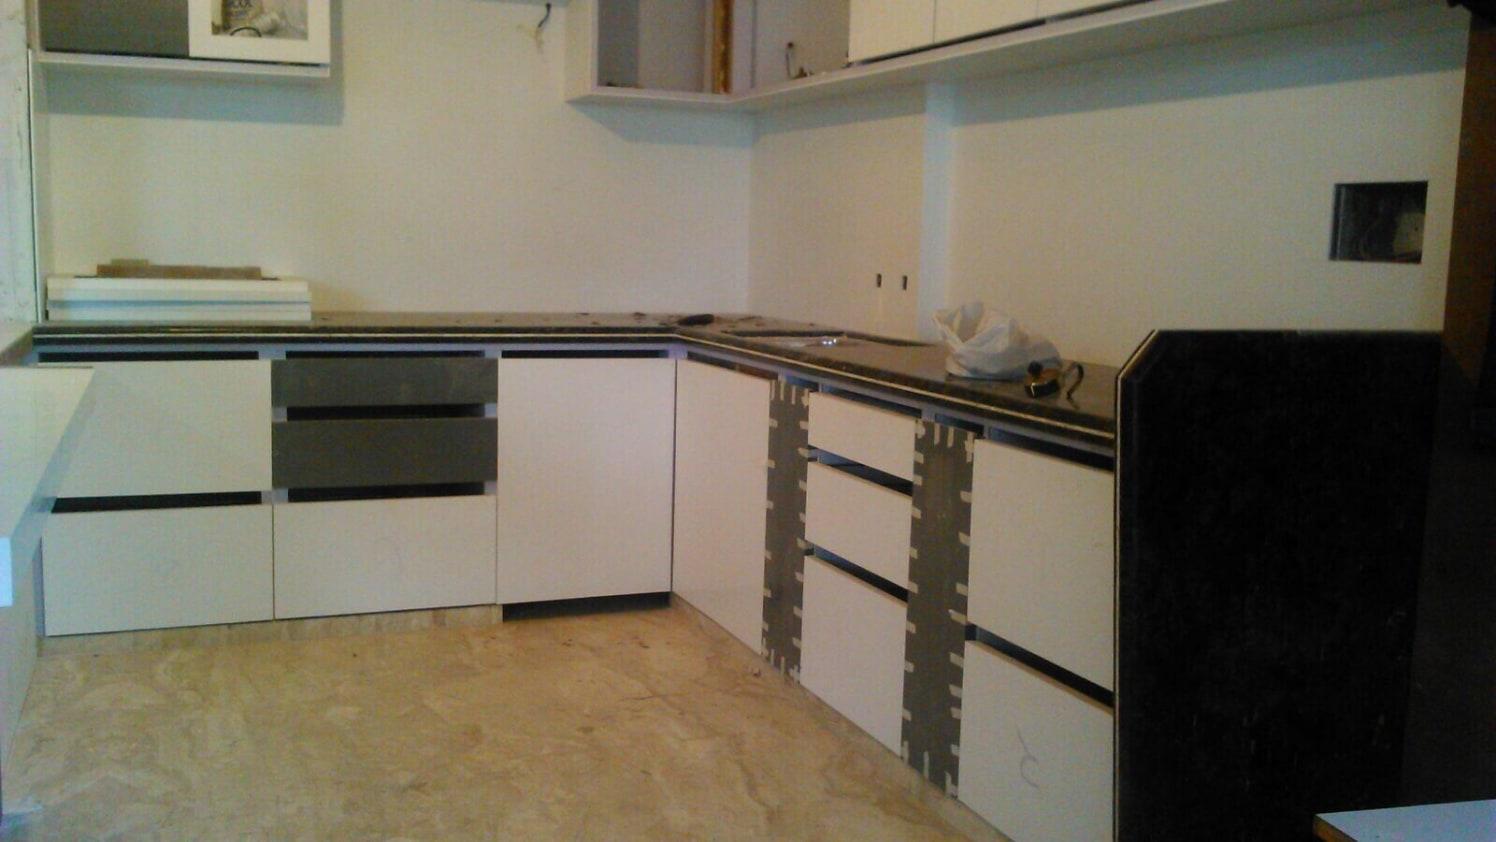 L shape kitchen with marble flooring by kavita.dhotre Modular-kitchen Minimalistic | Interior Design Photos & Ideas